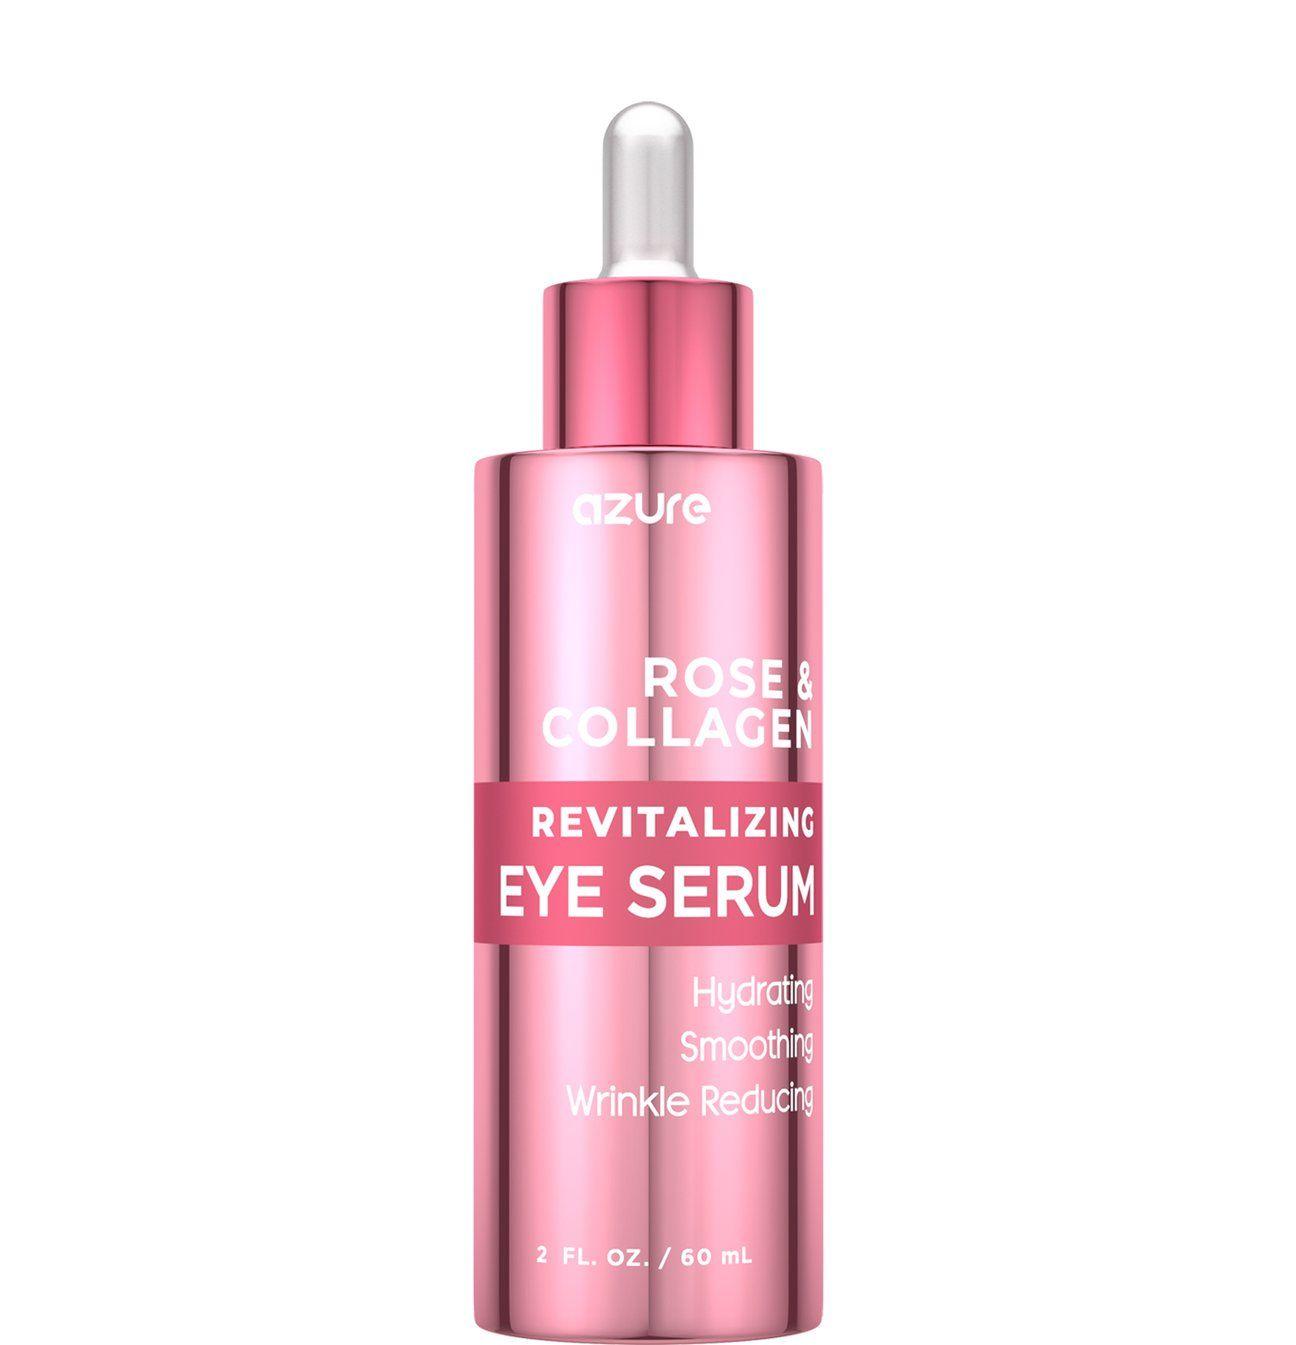 Rose And Collagen Revitalizing Eye Serum Eye Serum Castor Oil Wrinkles Smooth Skin Texture